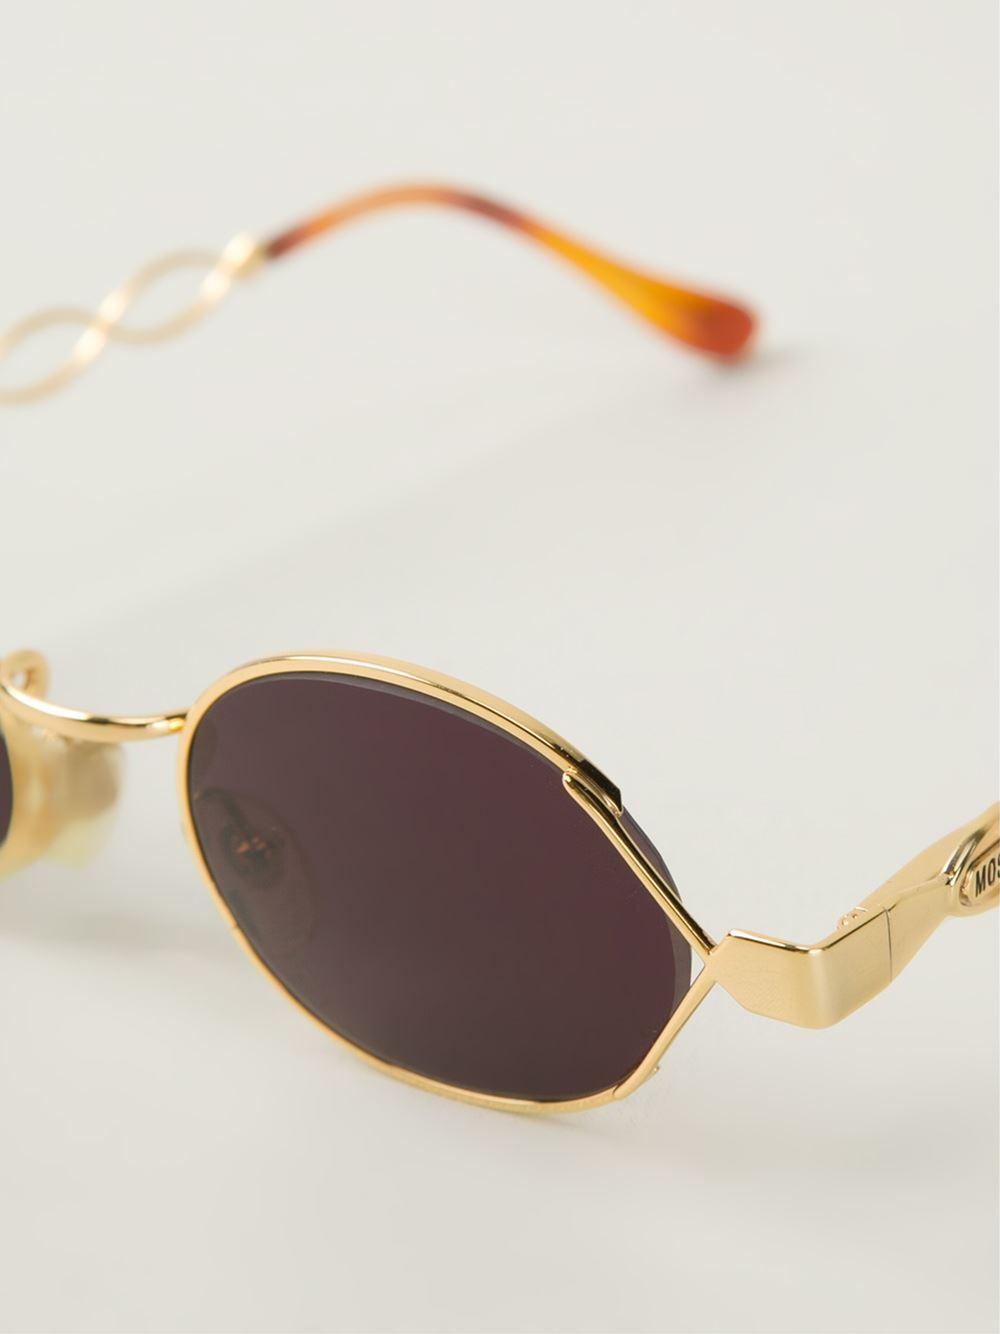 Moschino Round Frame Sunglasses in Metallic Lyst